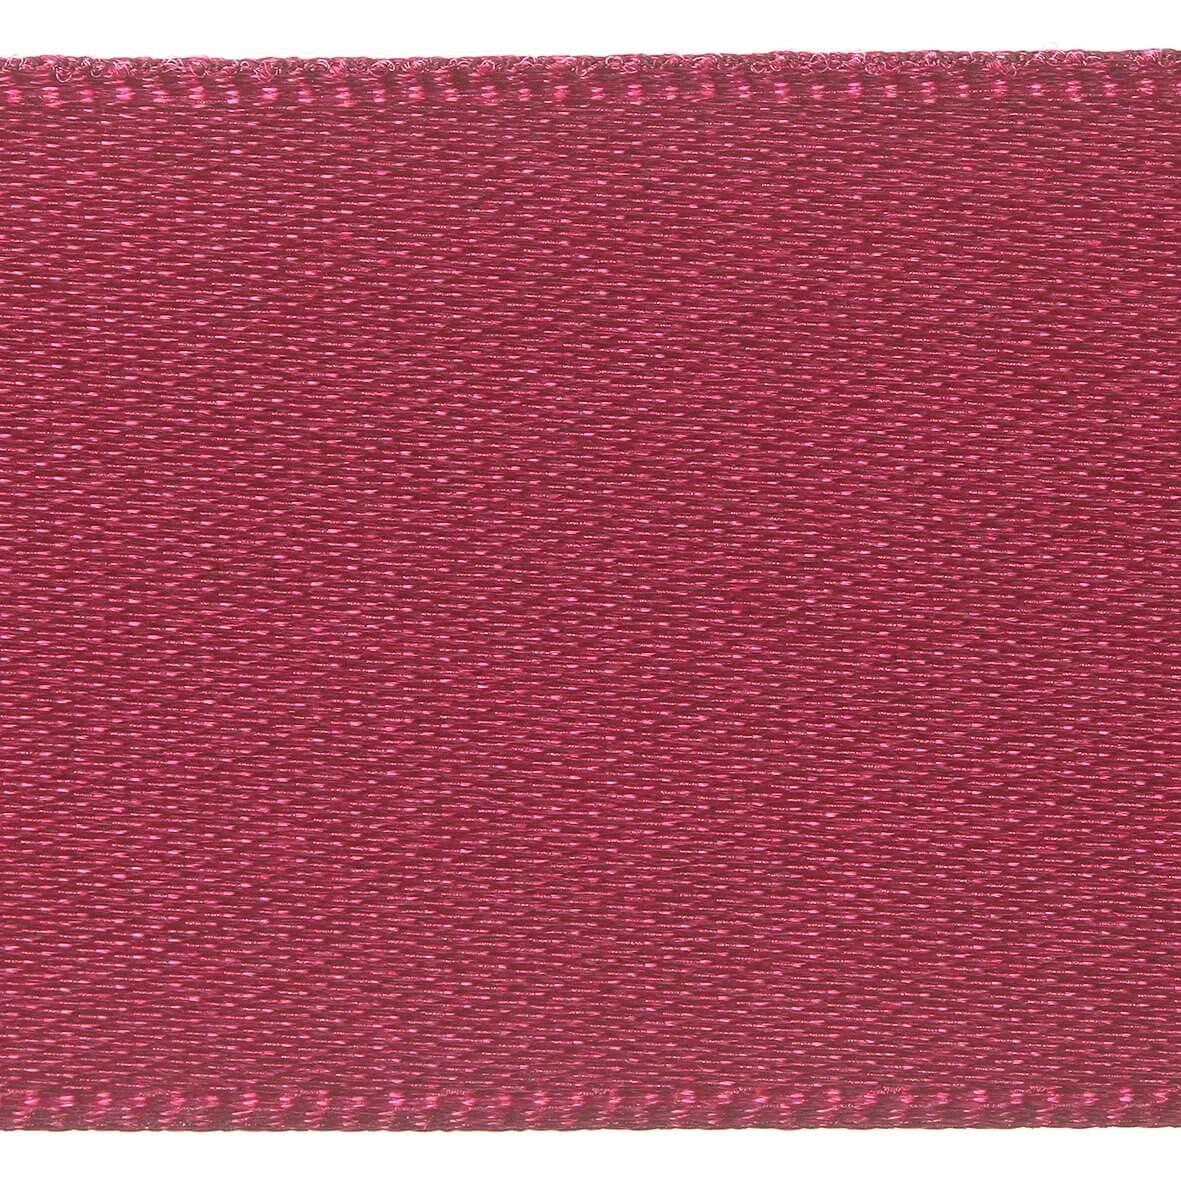 25mm Berisfords Satin Ribbon - Burgundy Colour 405